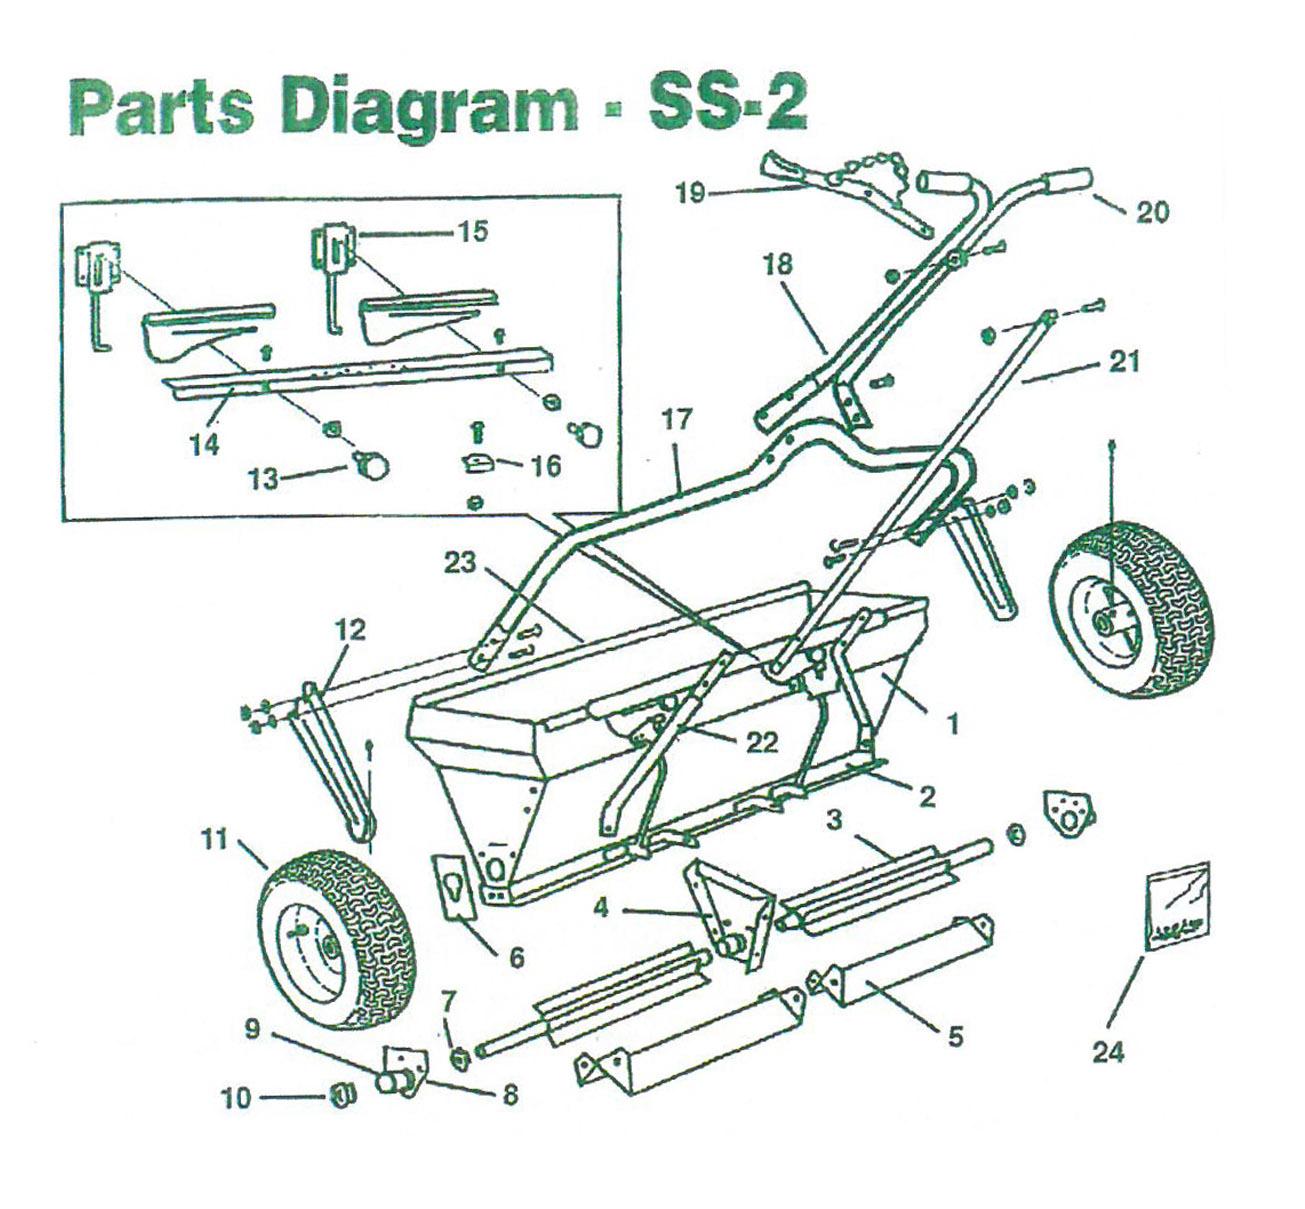 Scotts Drop Spreader Parts Diagram